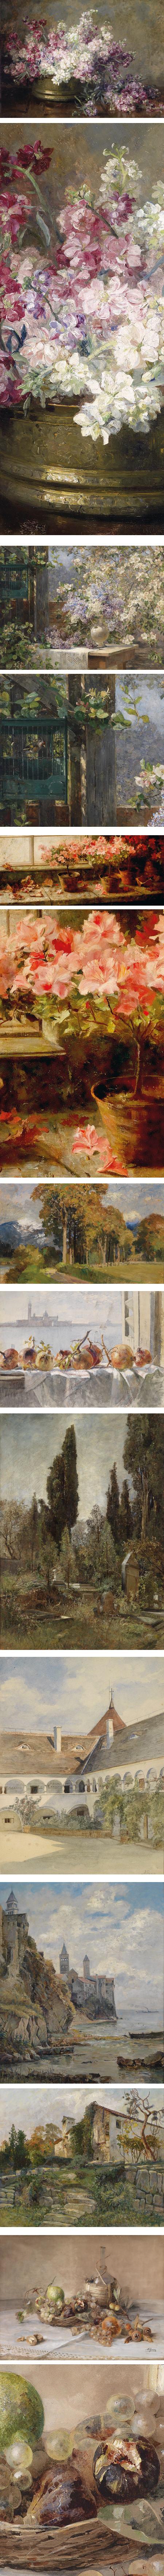 Marie Egner, Austrian painter, still life, florals, landsapes